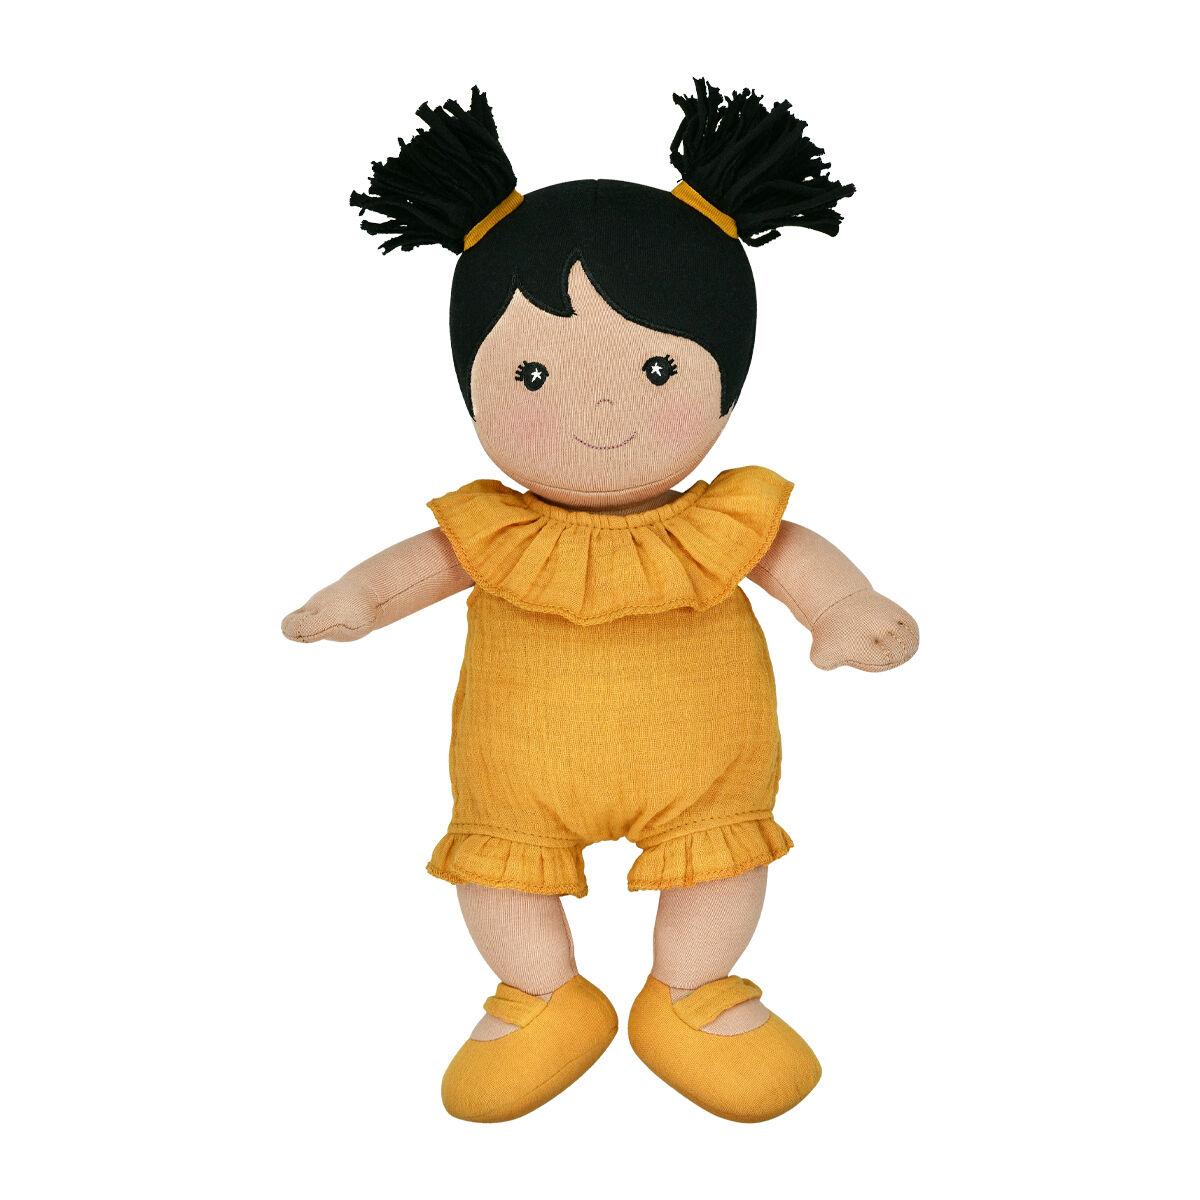 Apple Park Organic Plush Doll - Gwen